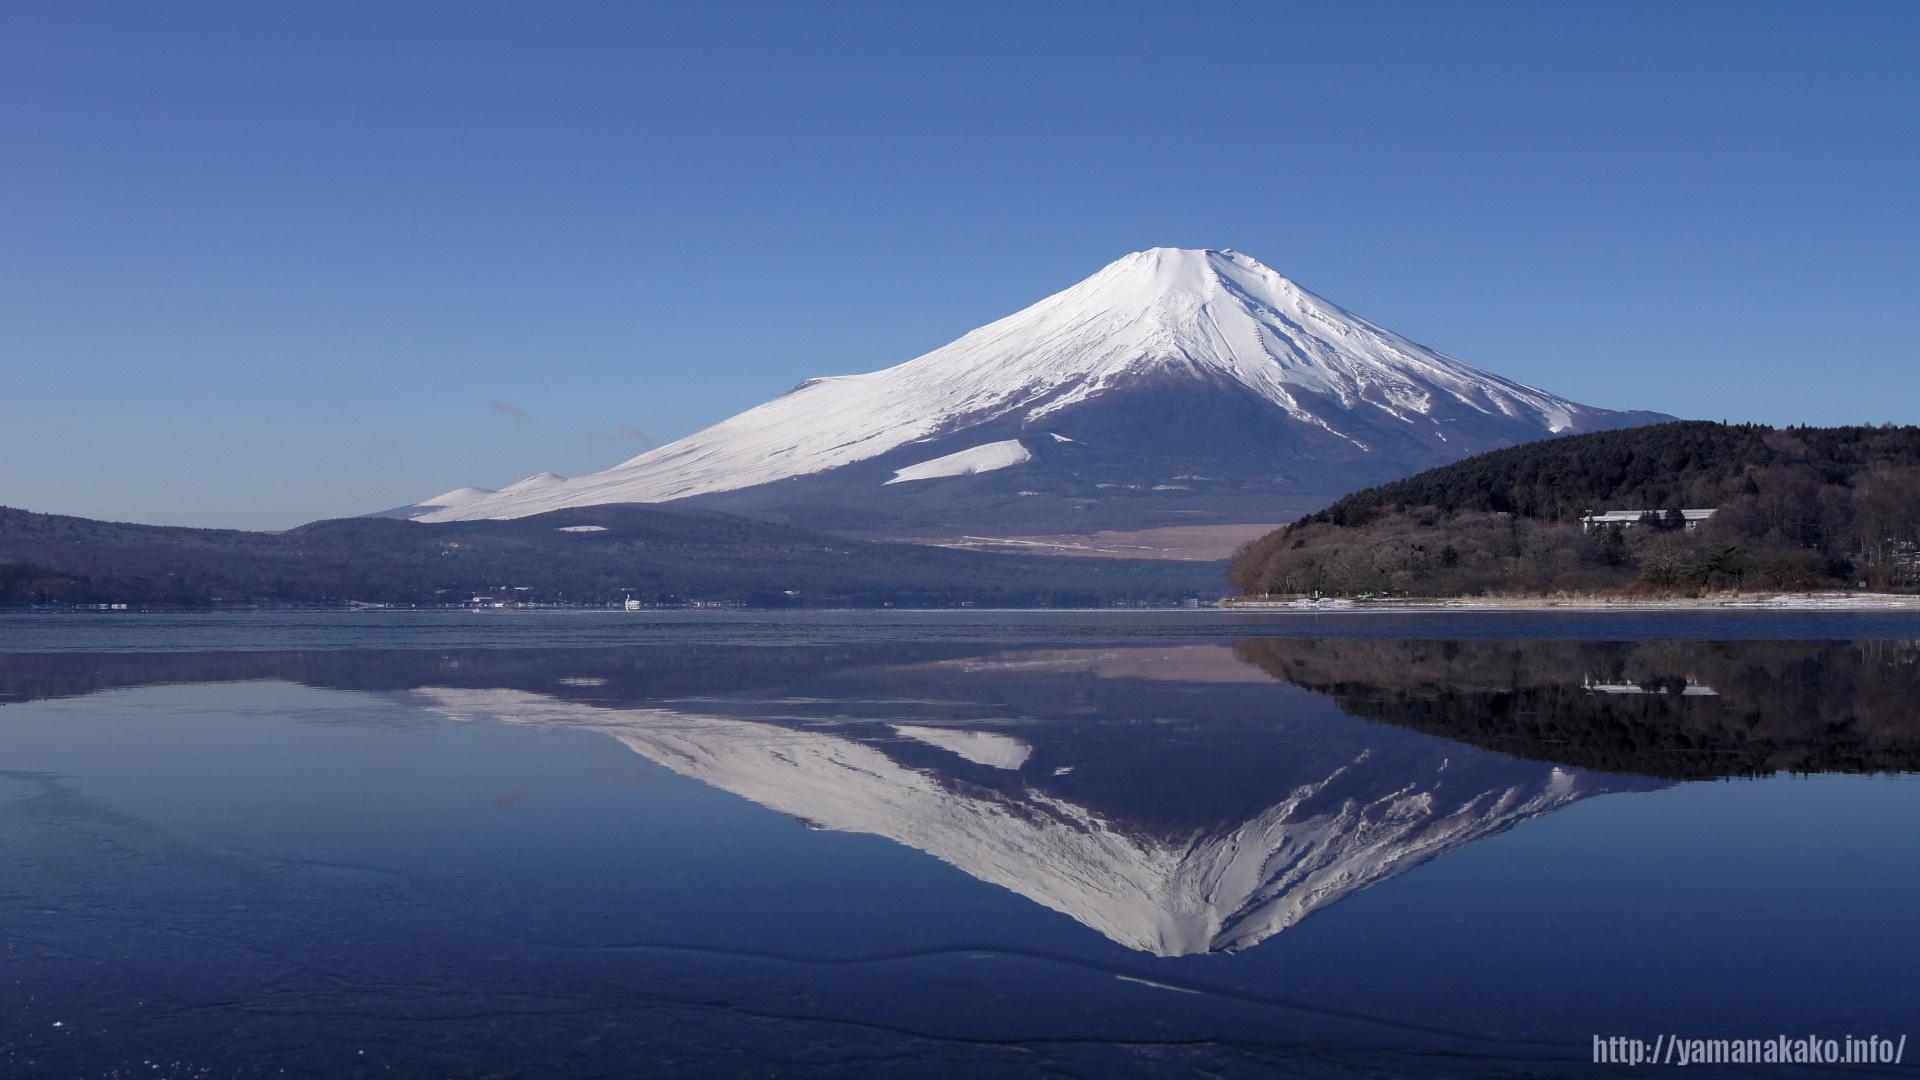 Lake Yamanaka : 2013年カレンダー ダウンロード : カレンダー